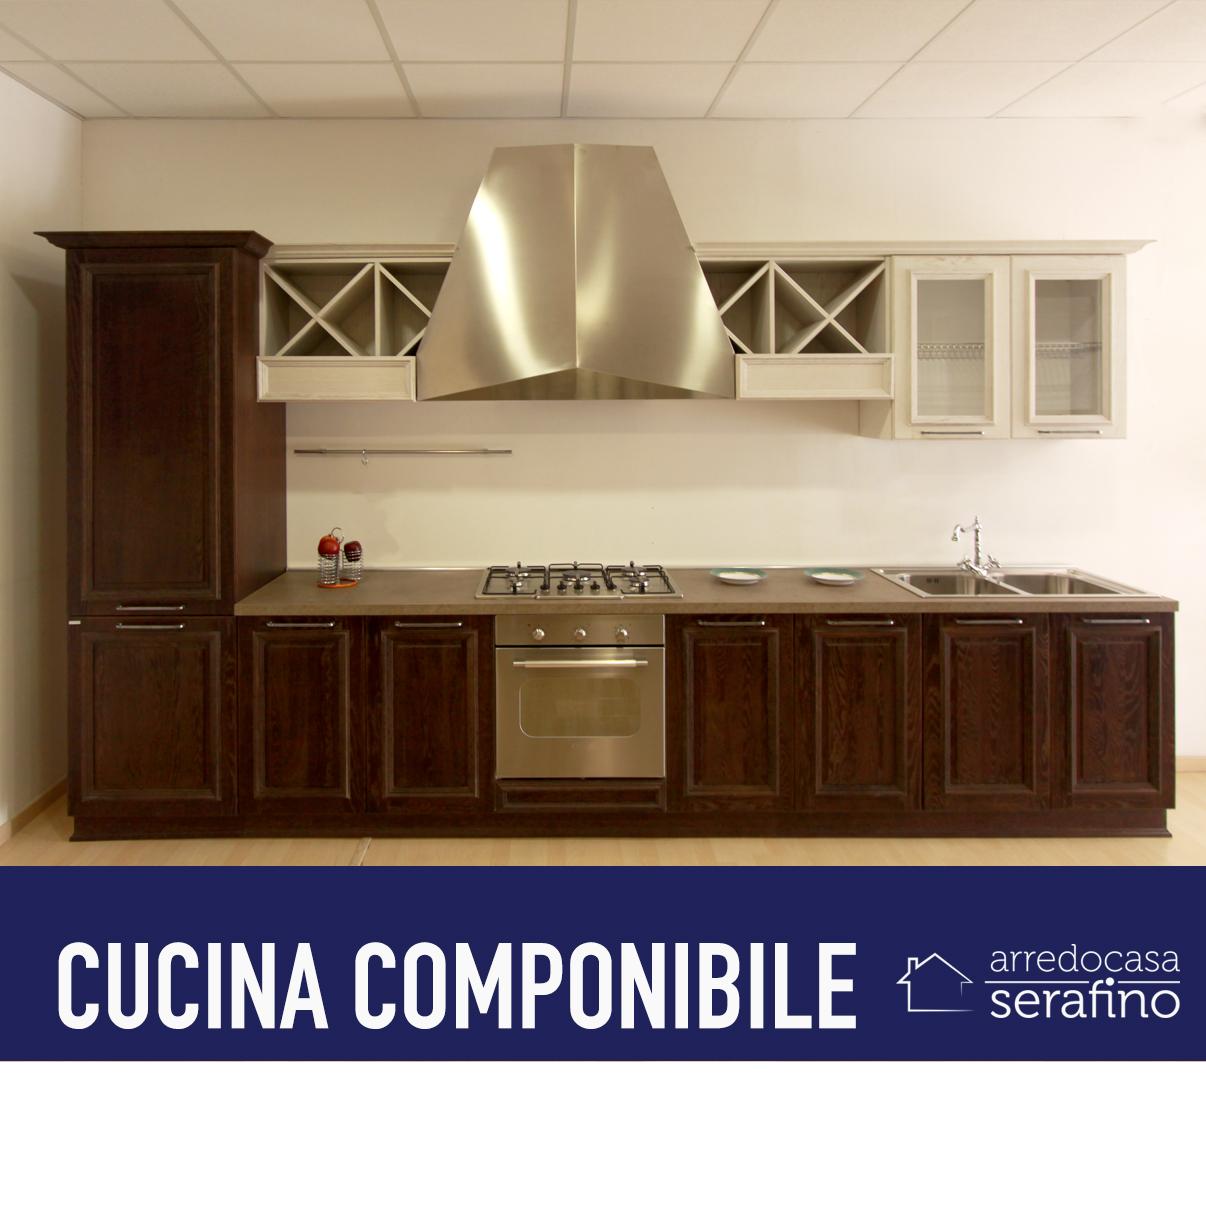 Cucina lineare 02 arredocasa serafino for Cucina lineare offerta